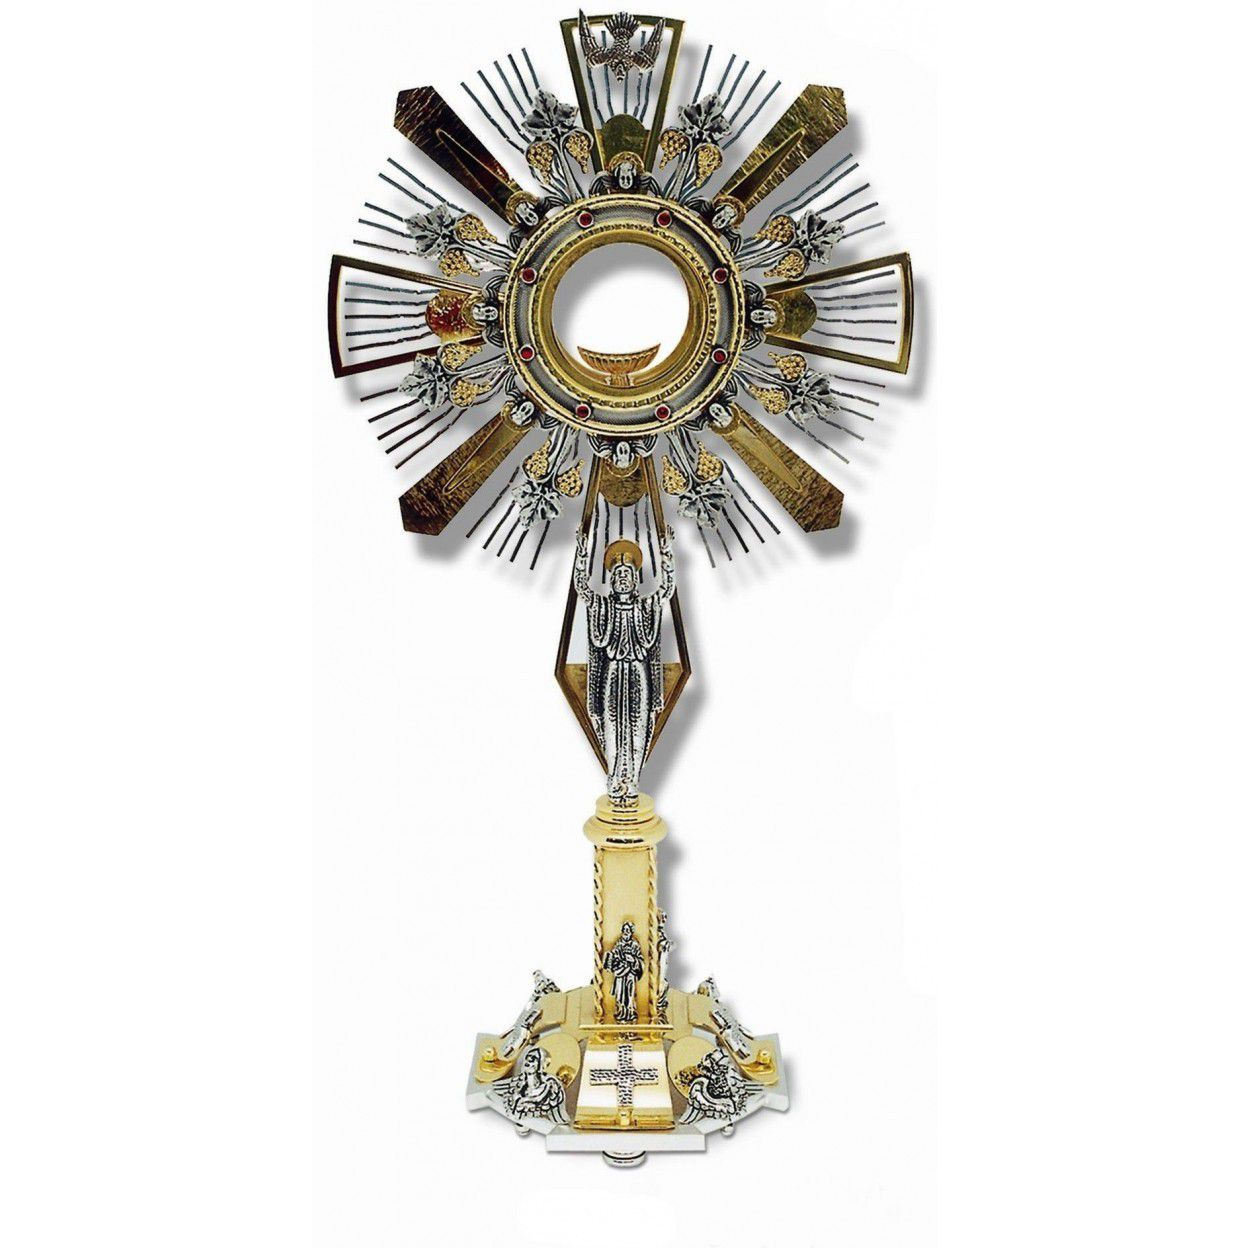 OSTENSÓRIO JESUS RESSUCITADO ITALIANO 14192